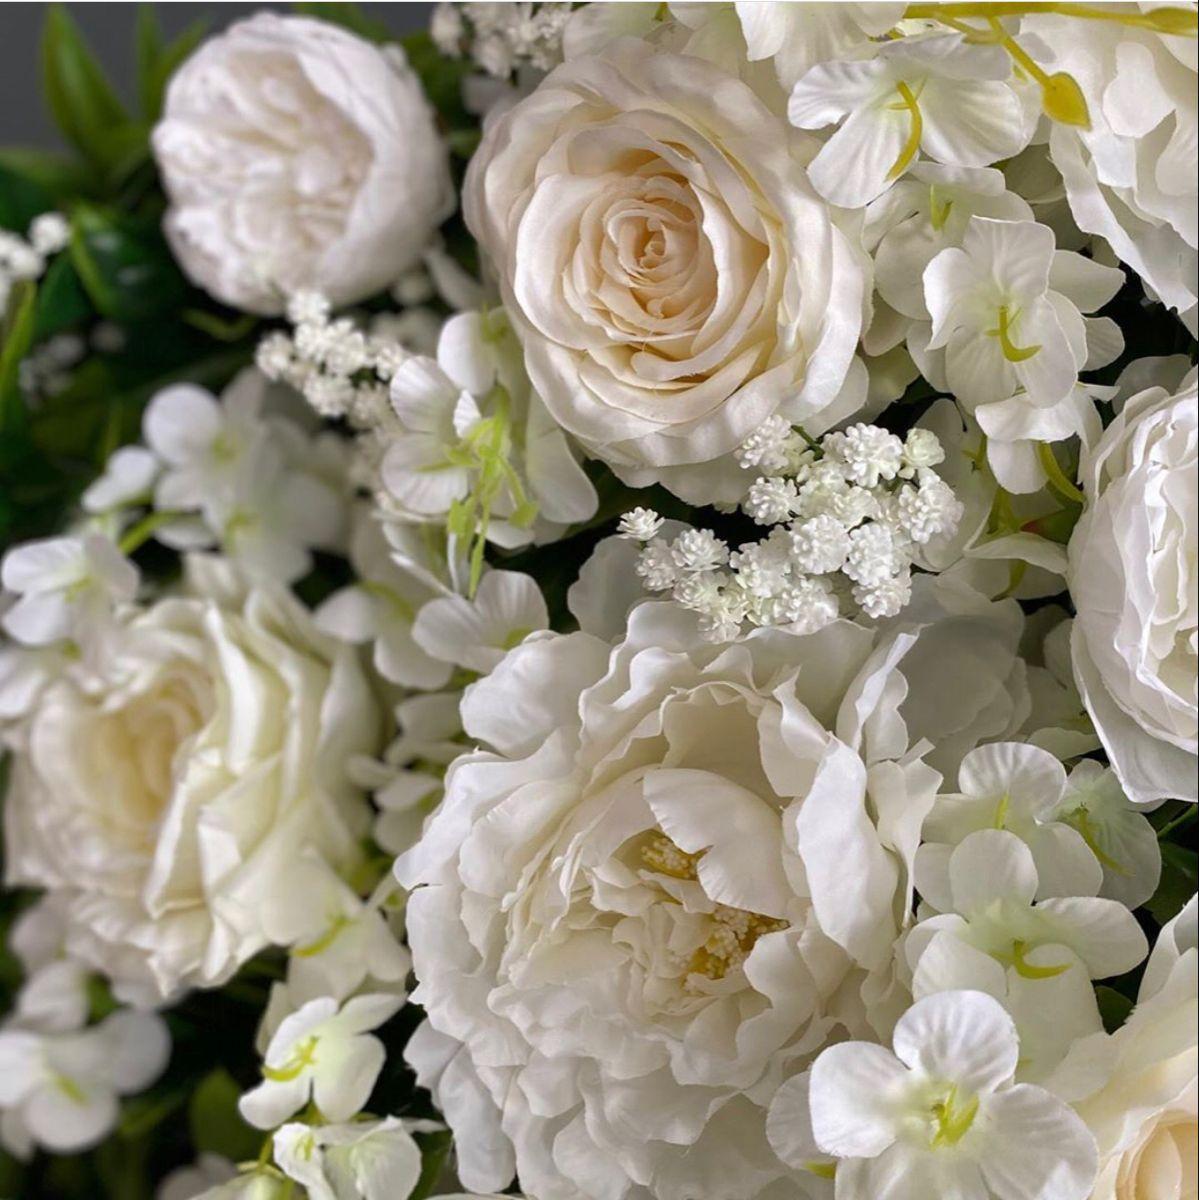 Baby Breath Flowers In 2020 Online Wedding Flowers Flowers For Sale Flowers